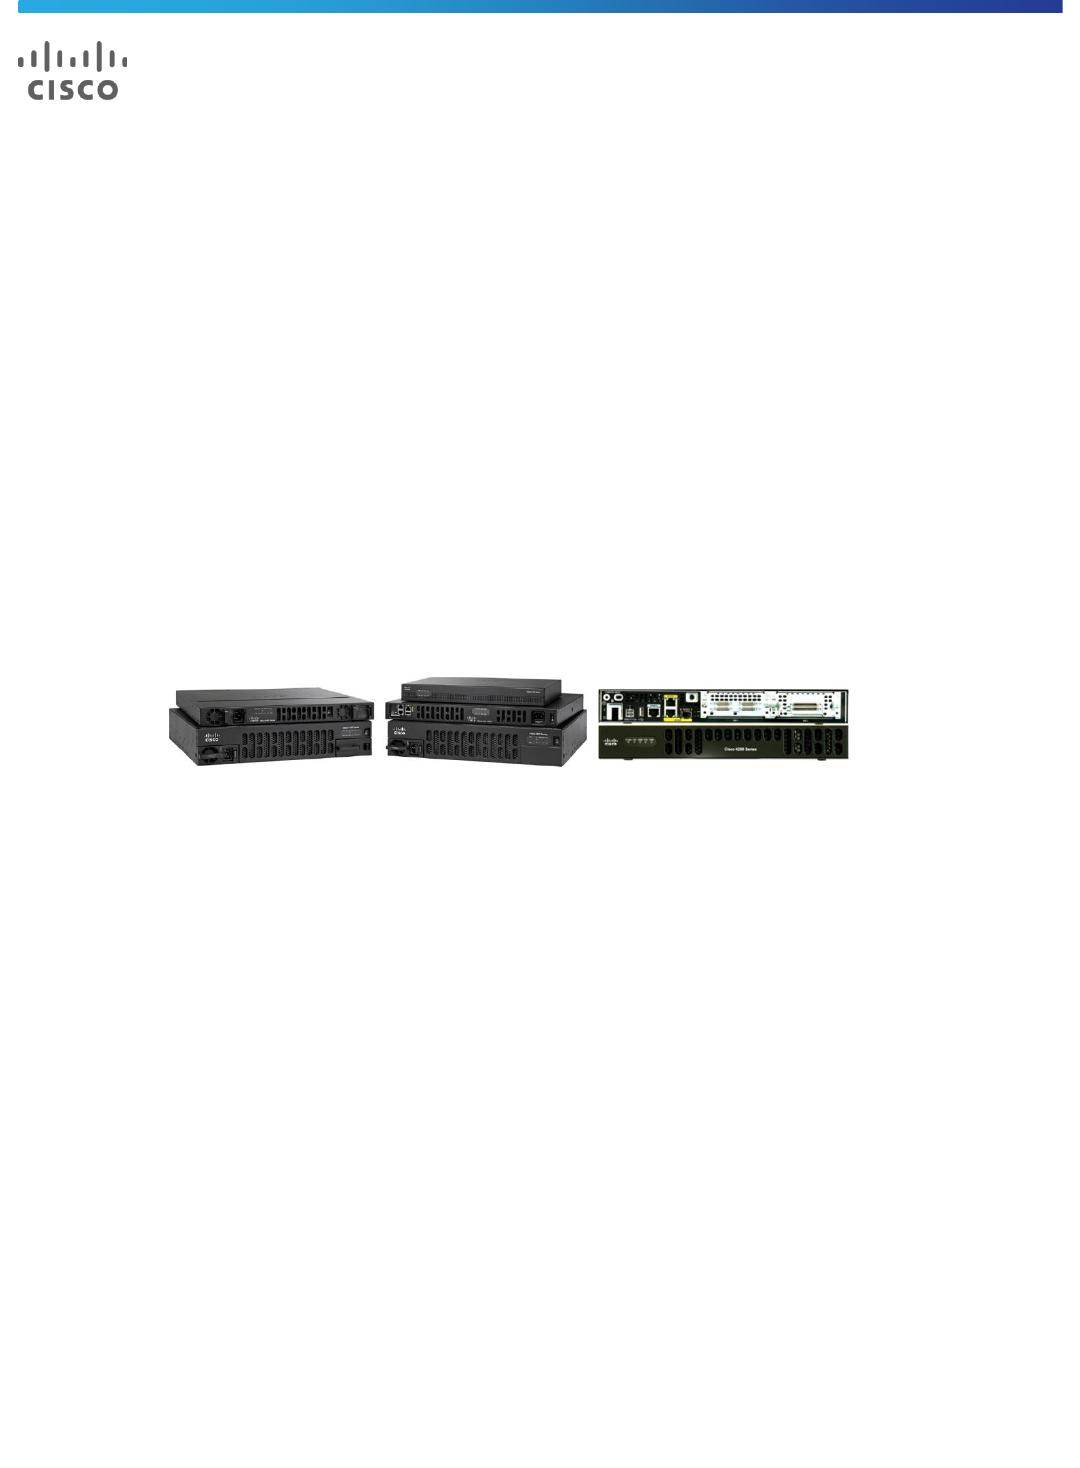 Cisco 4221 Datasheet Pdf